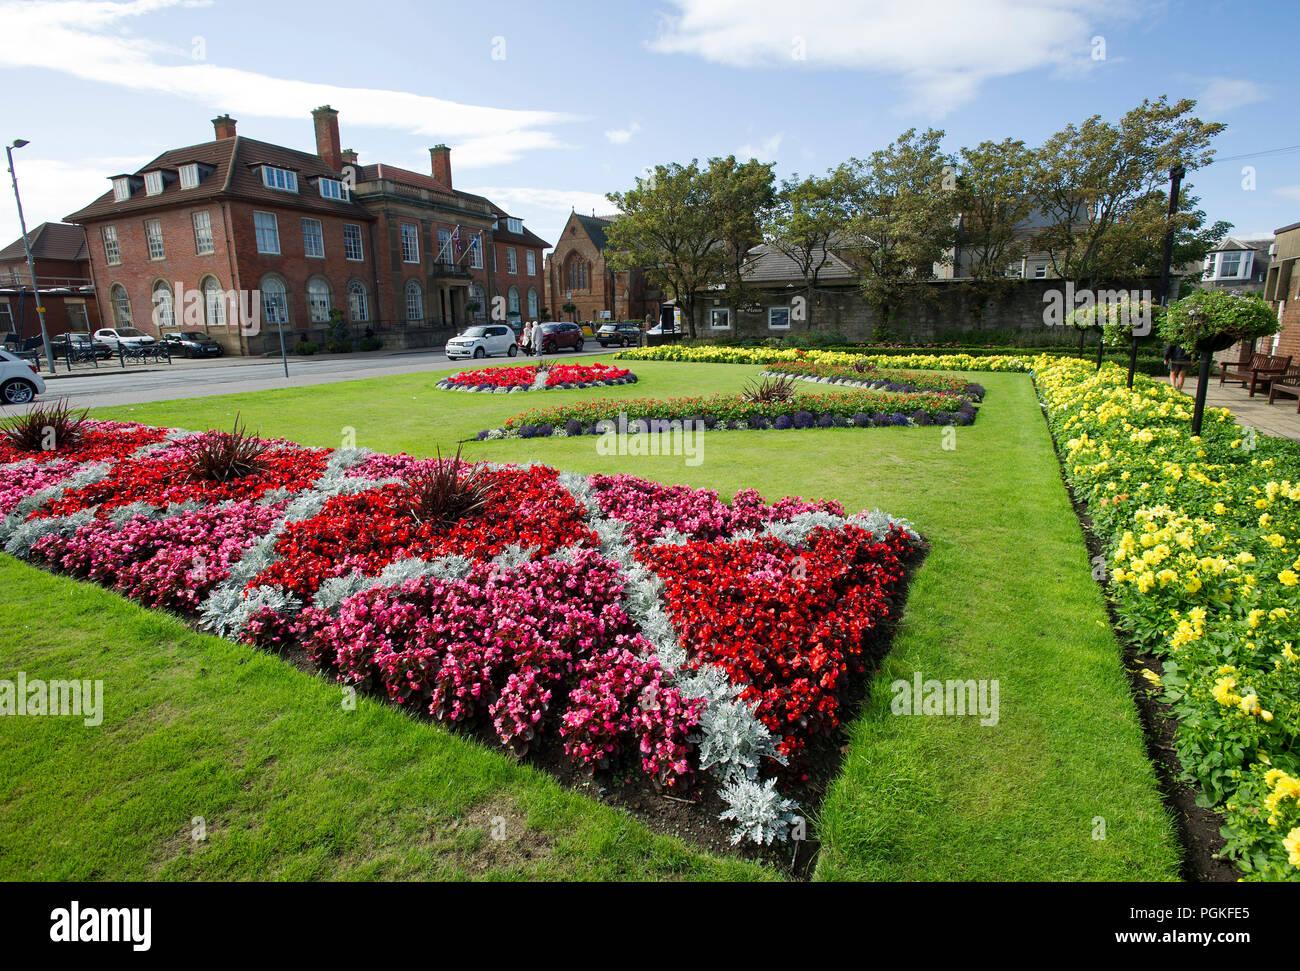 Giardini in fiore south beach troon ayrshire foto & immagine stock